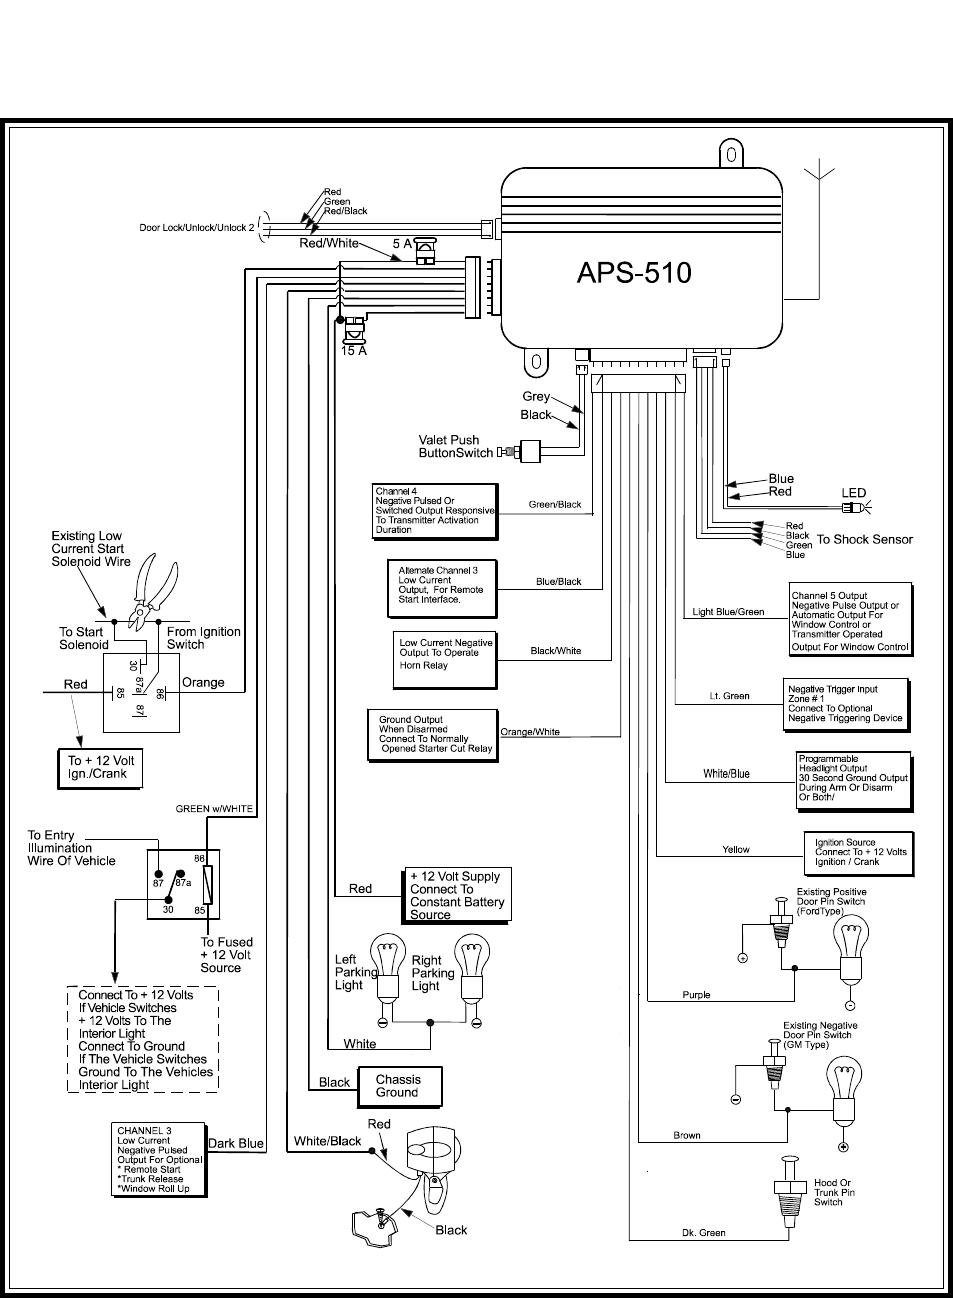 se_8376] avital 3100 wiring diagram free picture wiring diagram schematic  download diagram  ariot bocep mohammedshrine librar wiring 101